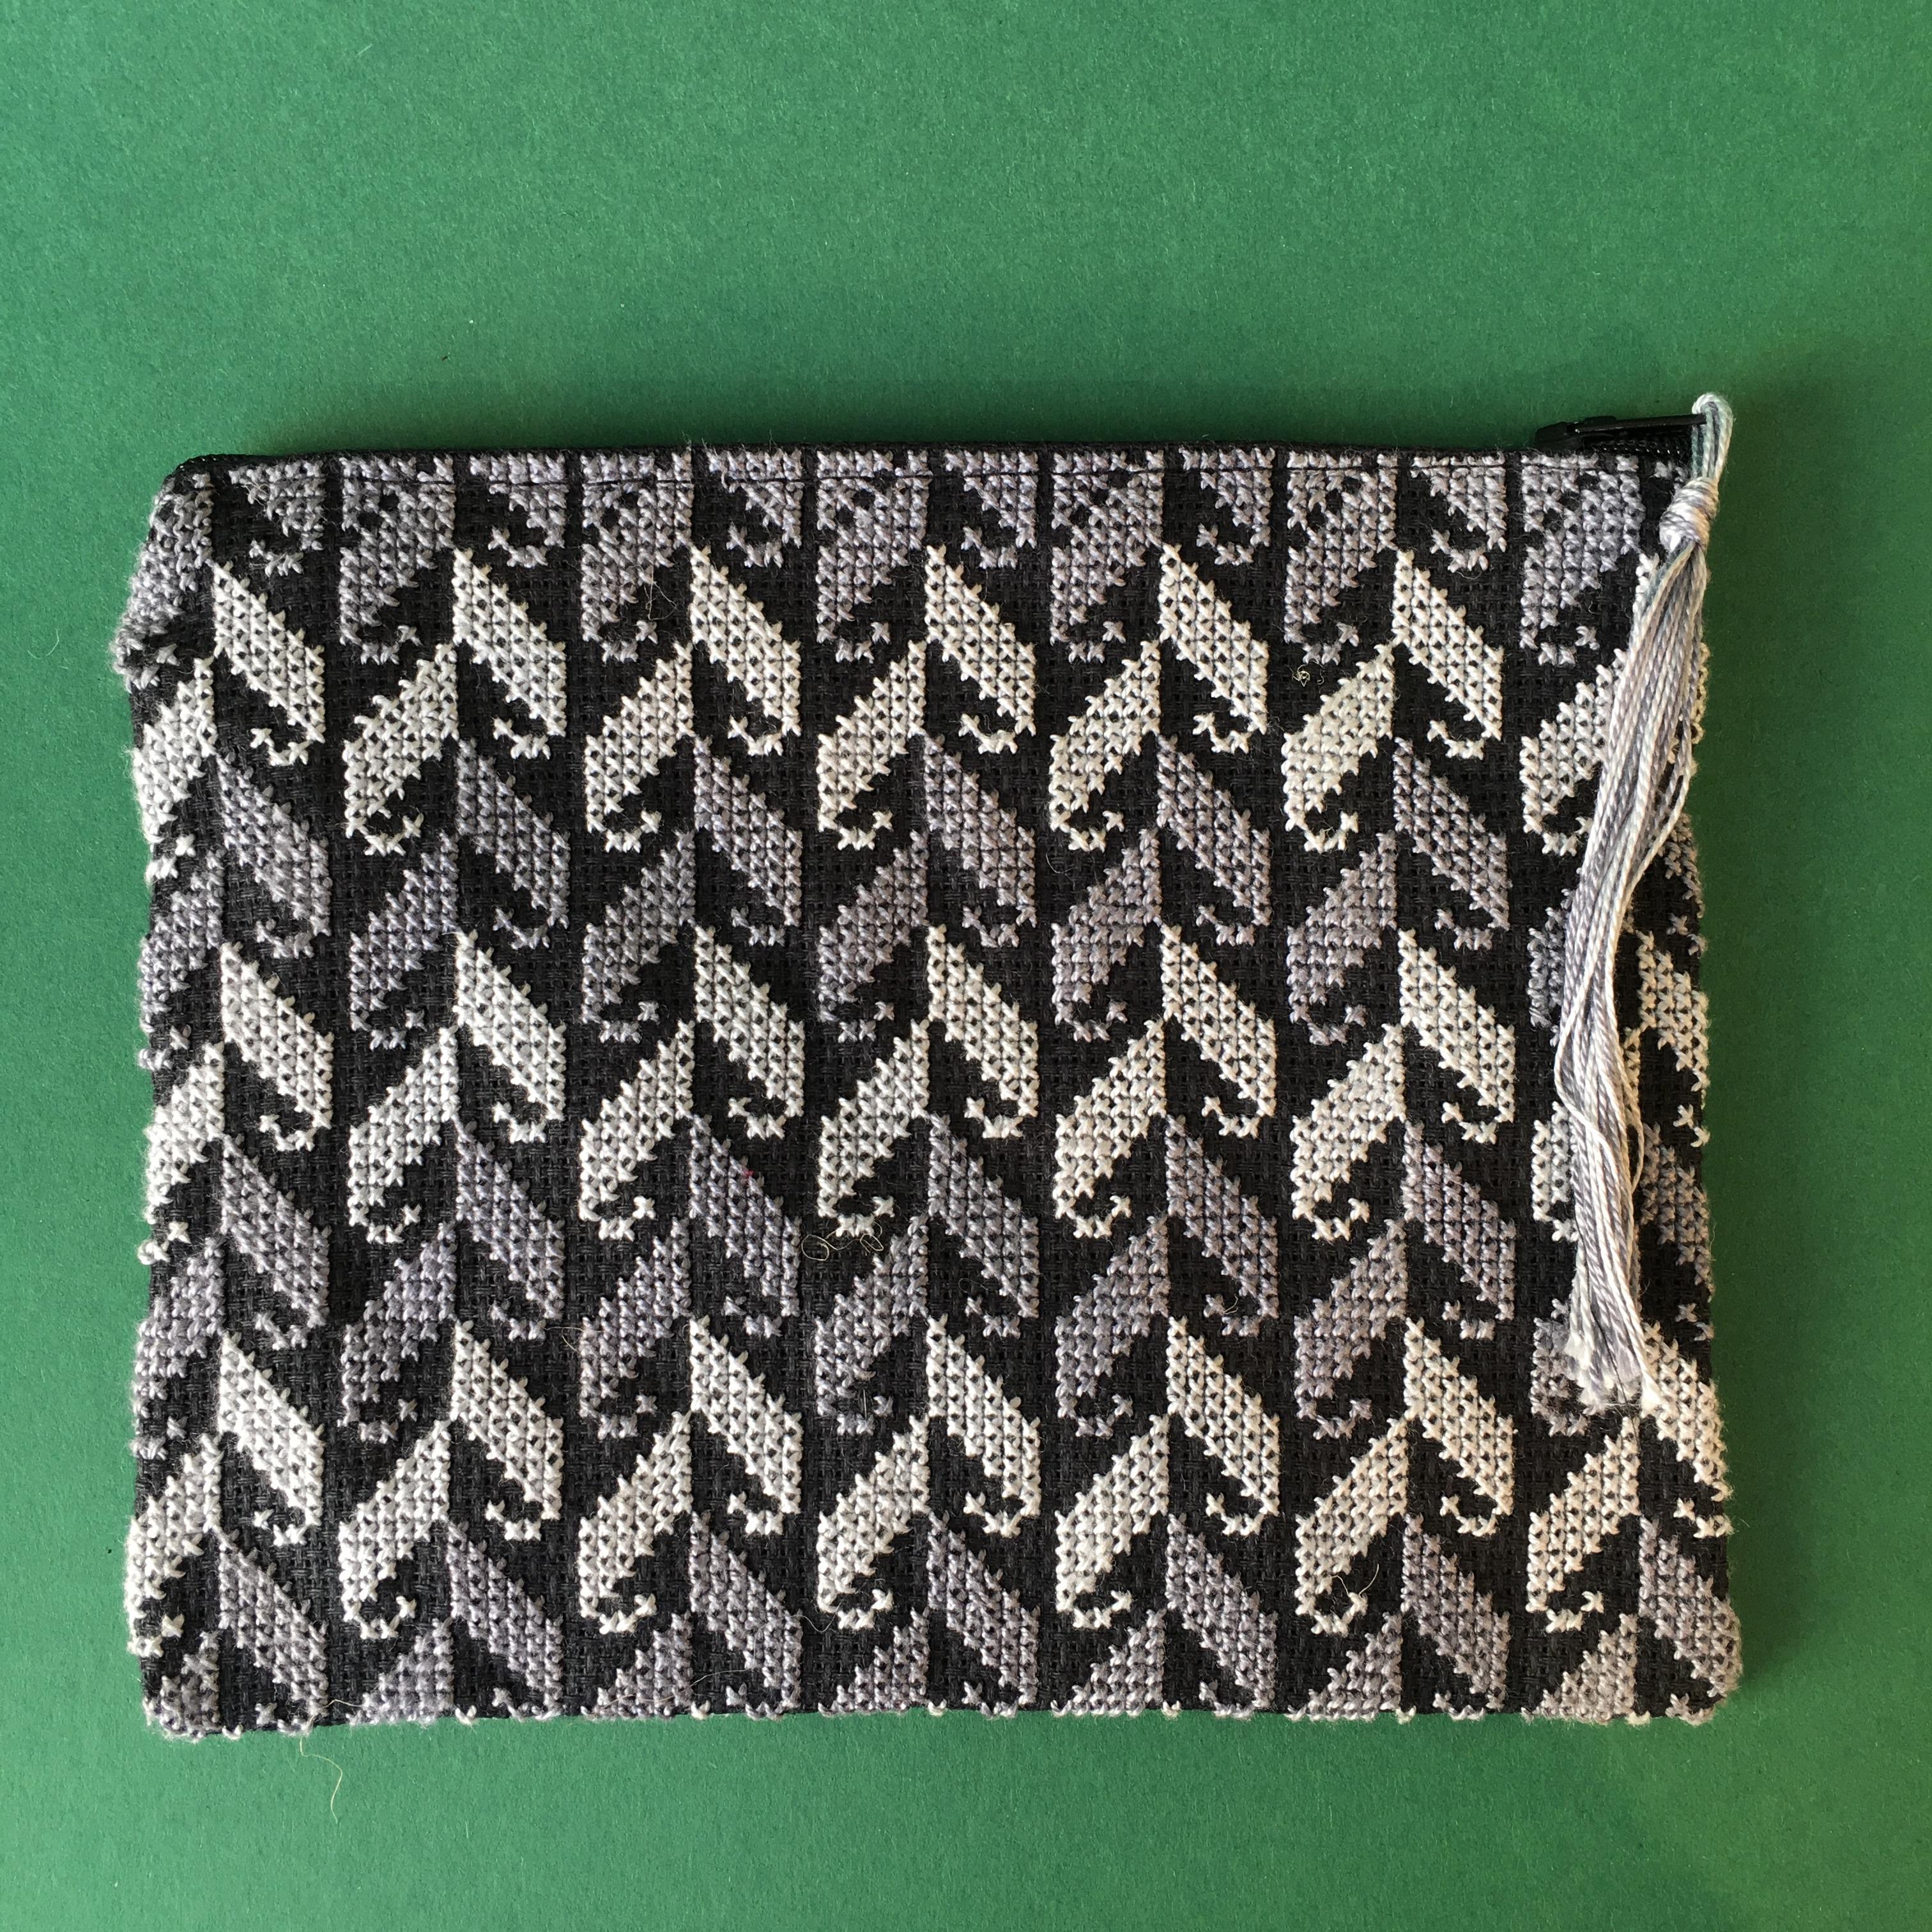 Stor brodert pung, svart og grå